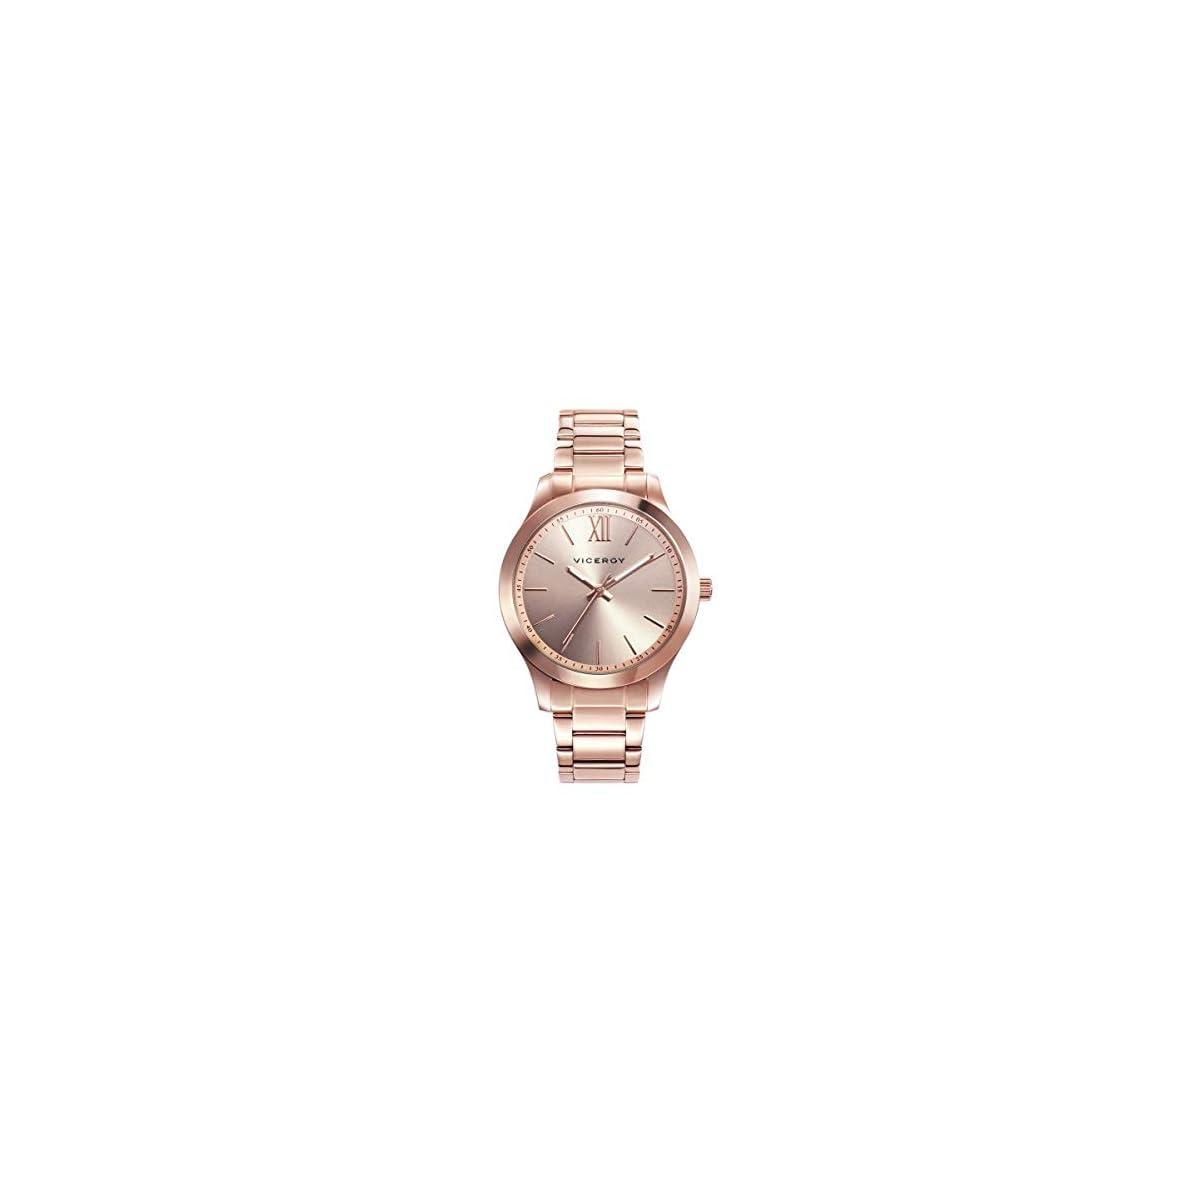 41XkNxpWPrL. SS1200  - Viceroy 401068-93 - Reloj para Mujer Acero IP Oro Rosa